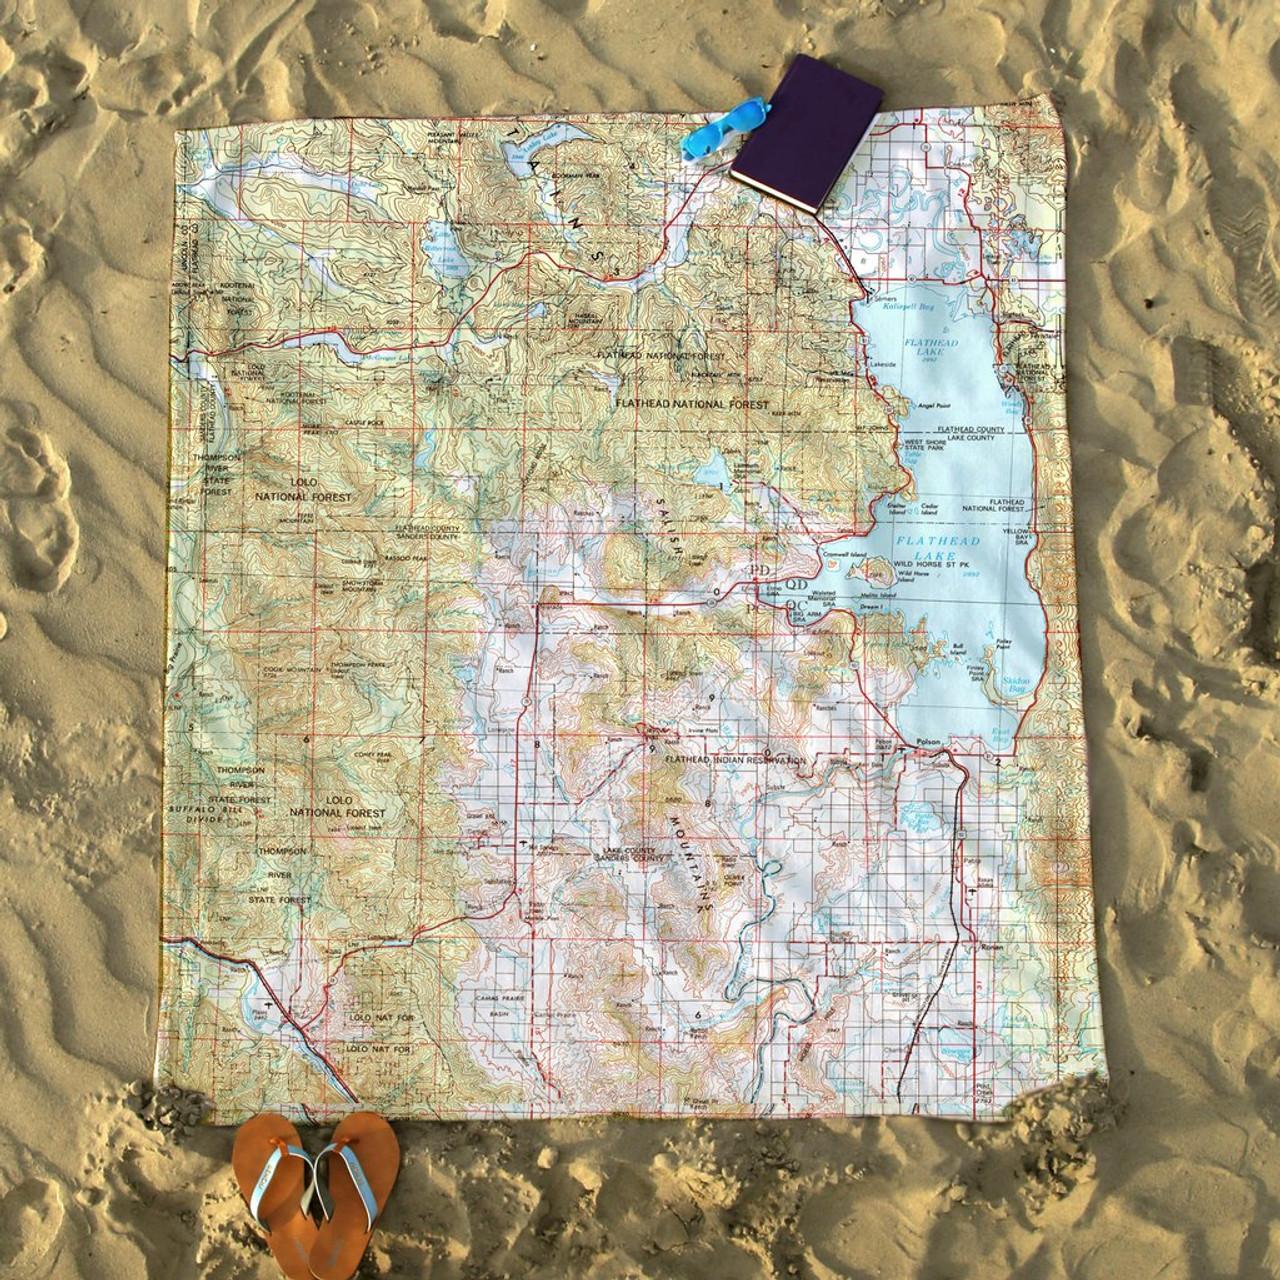 Nautical Blanket - Newport, RI #1